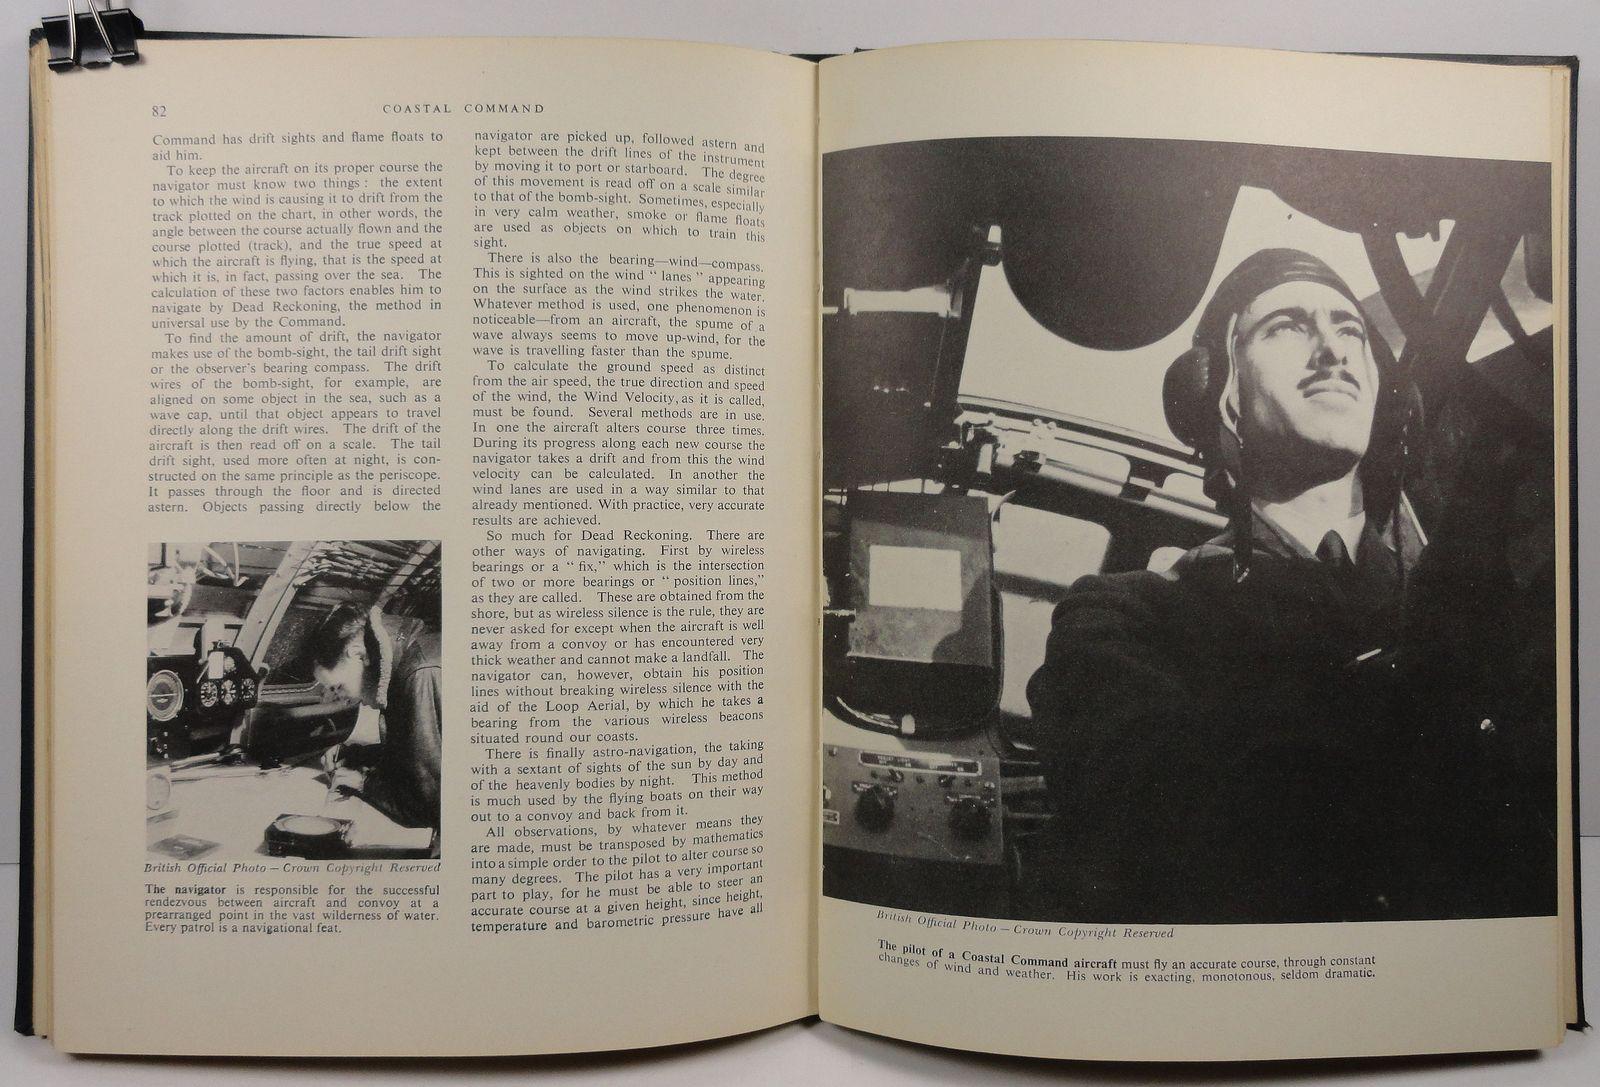 Coastal Command 1943 Air Ministry Account